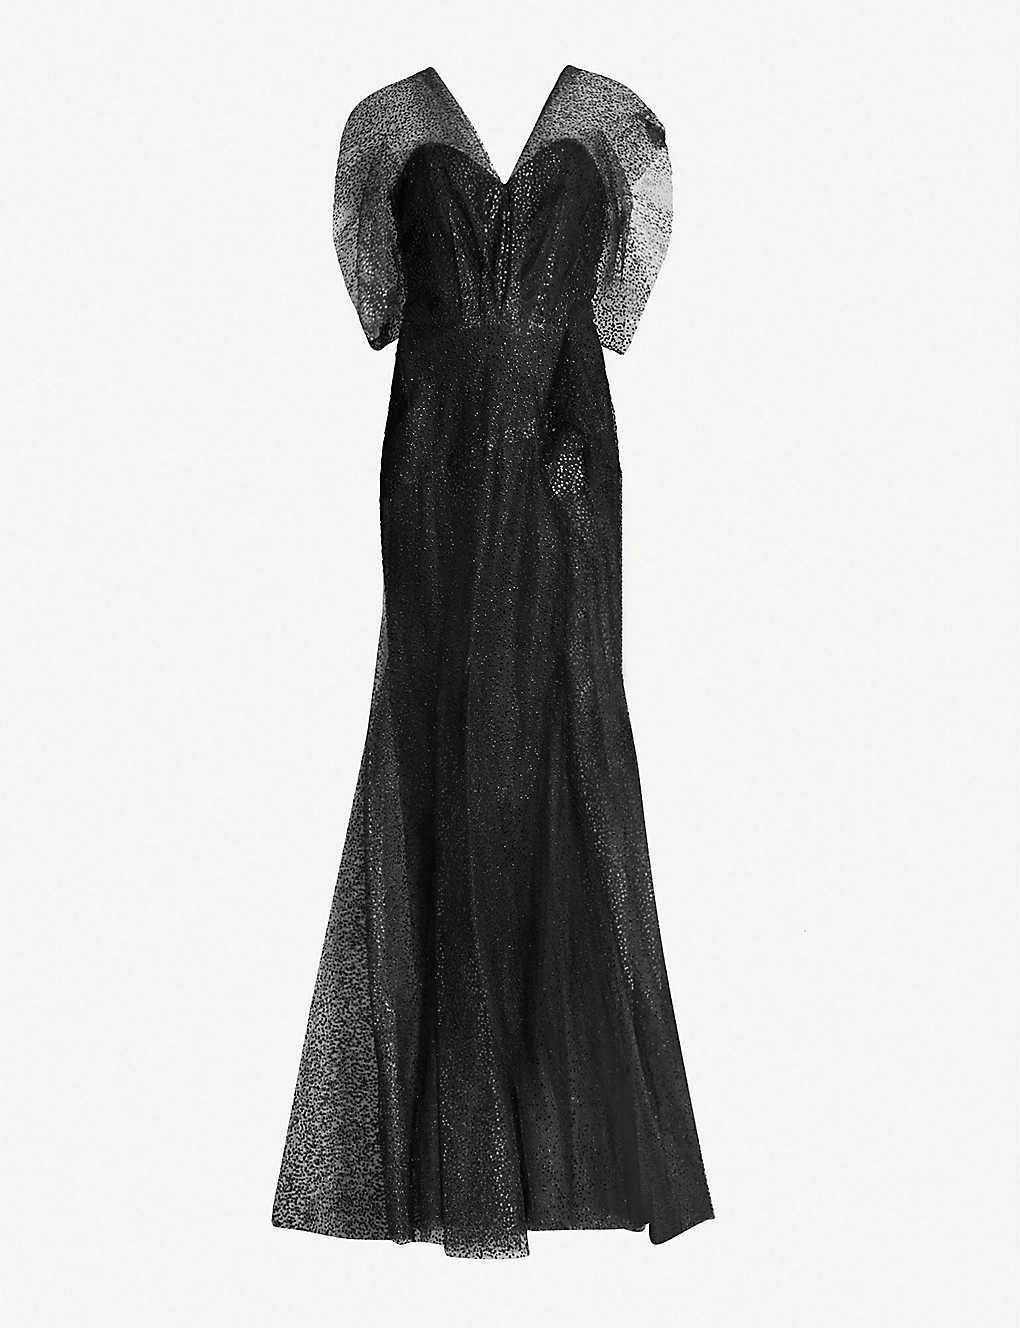 5ddf3508249f ROLAND MOURET - Hiscot tulle-overlay crepe gown | Selfridges.com